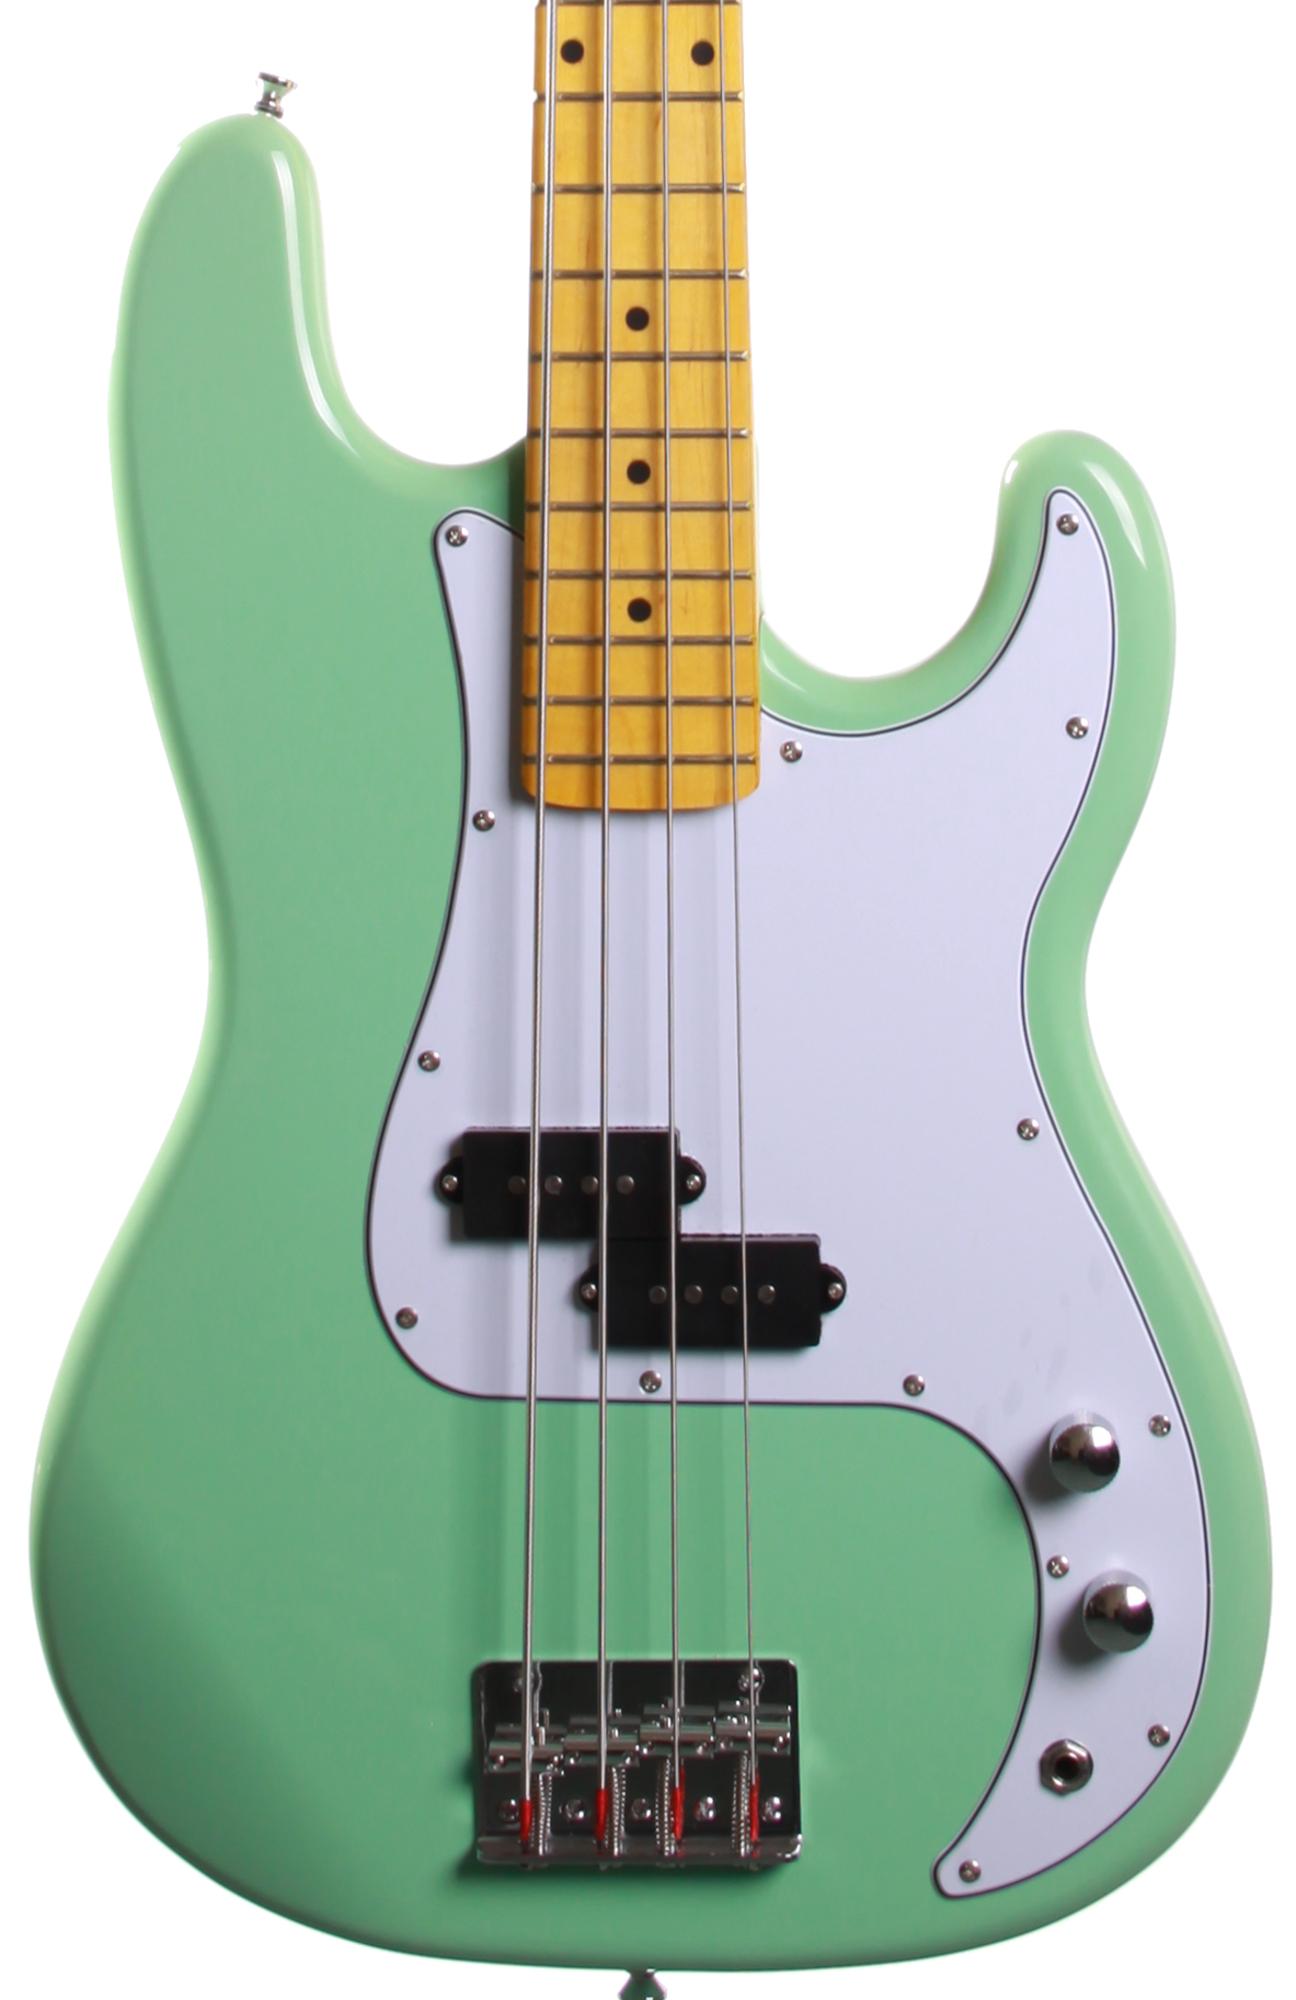 Cassidy Guitars British made Bluesvill Bass guitar